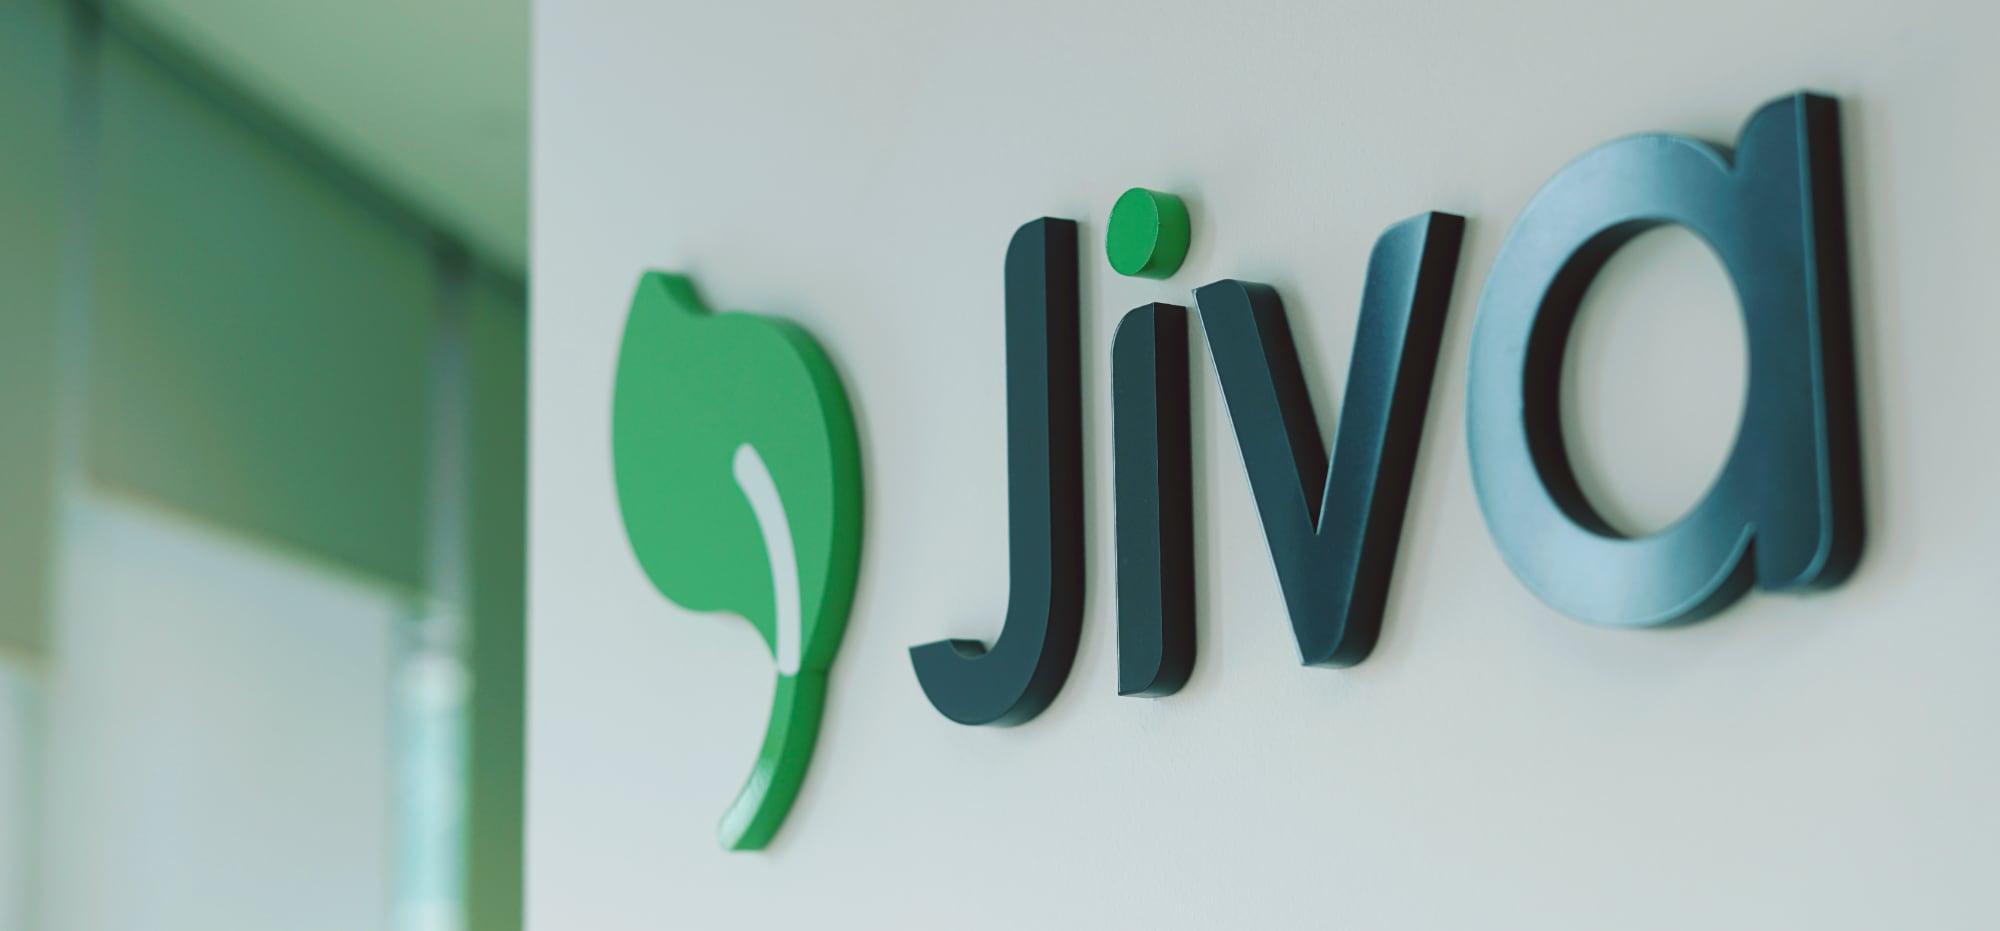 Jiva signboard.